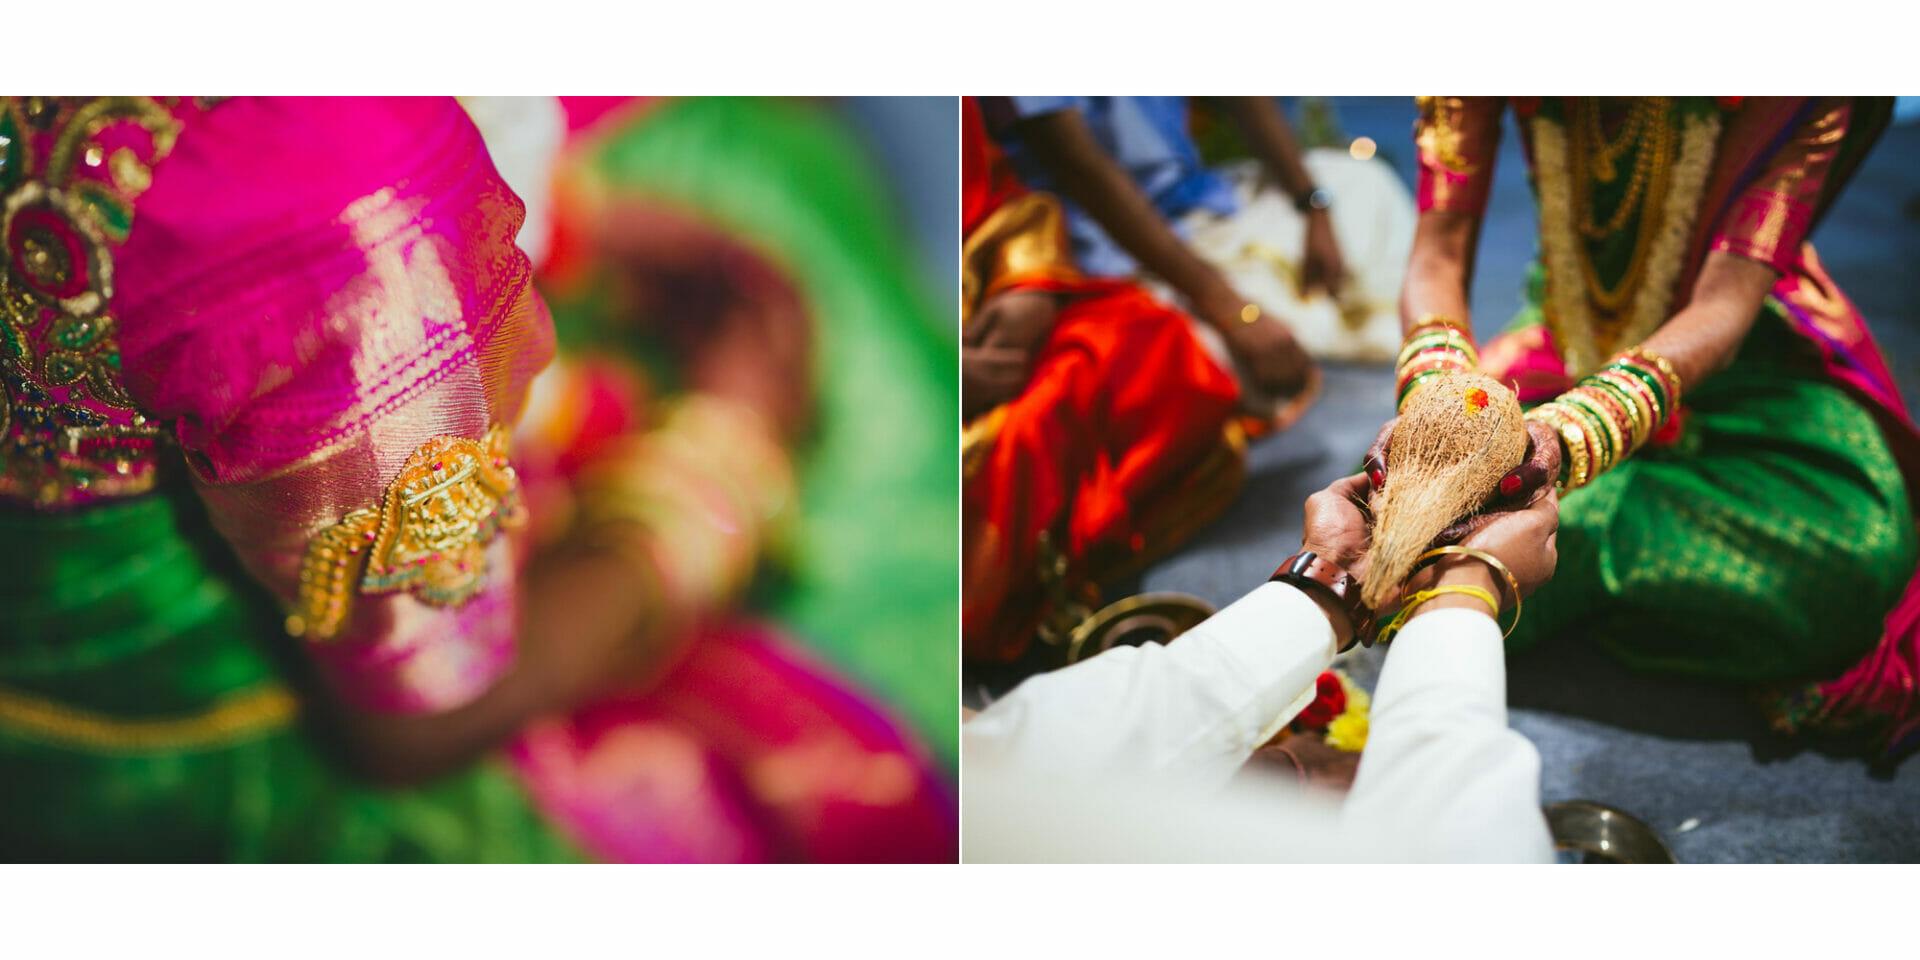 shruti annayya sree vikash photography wedding kalathur gardens 25